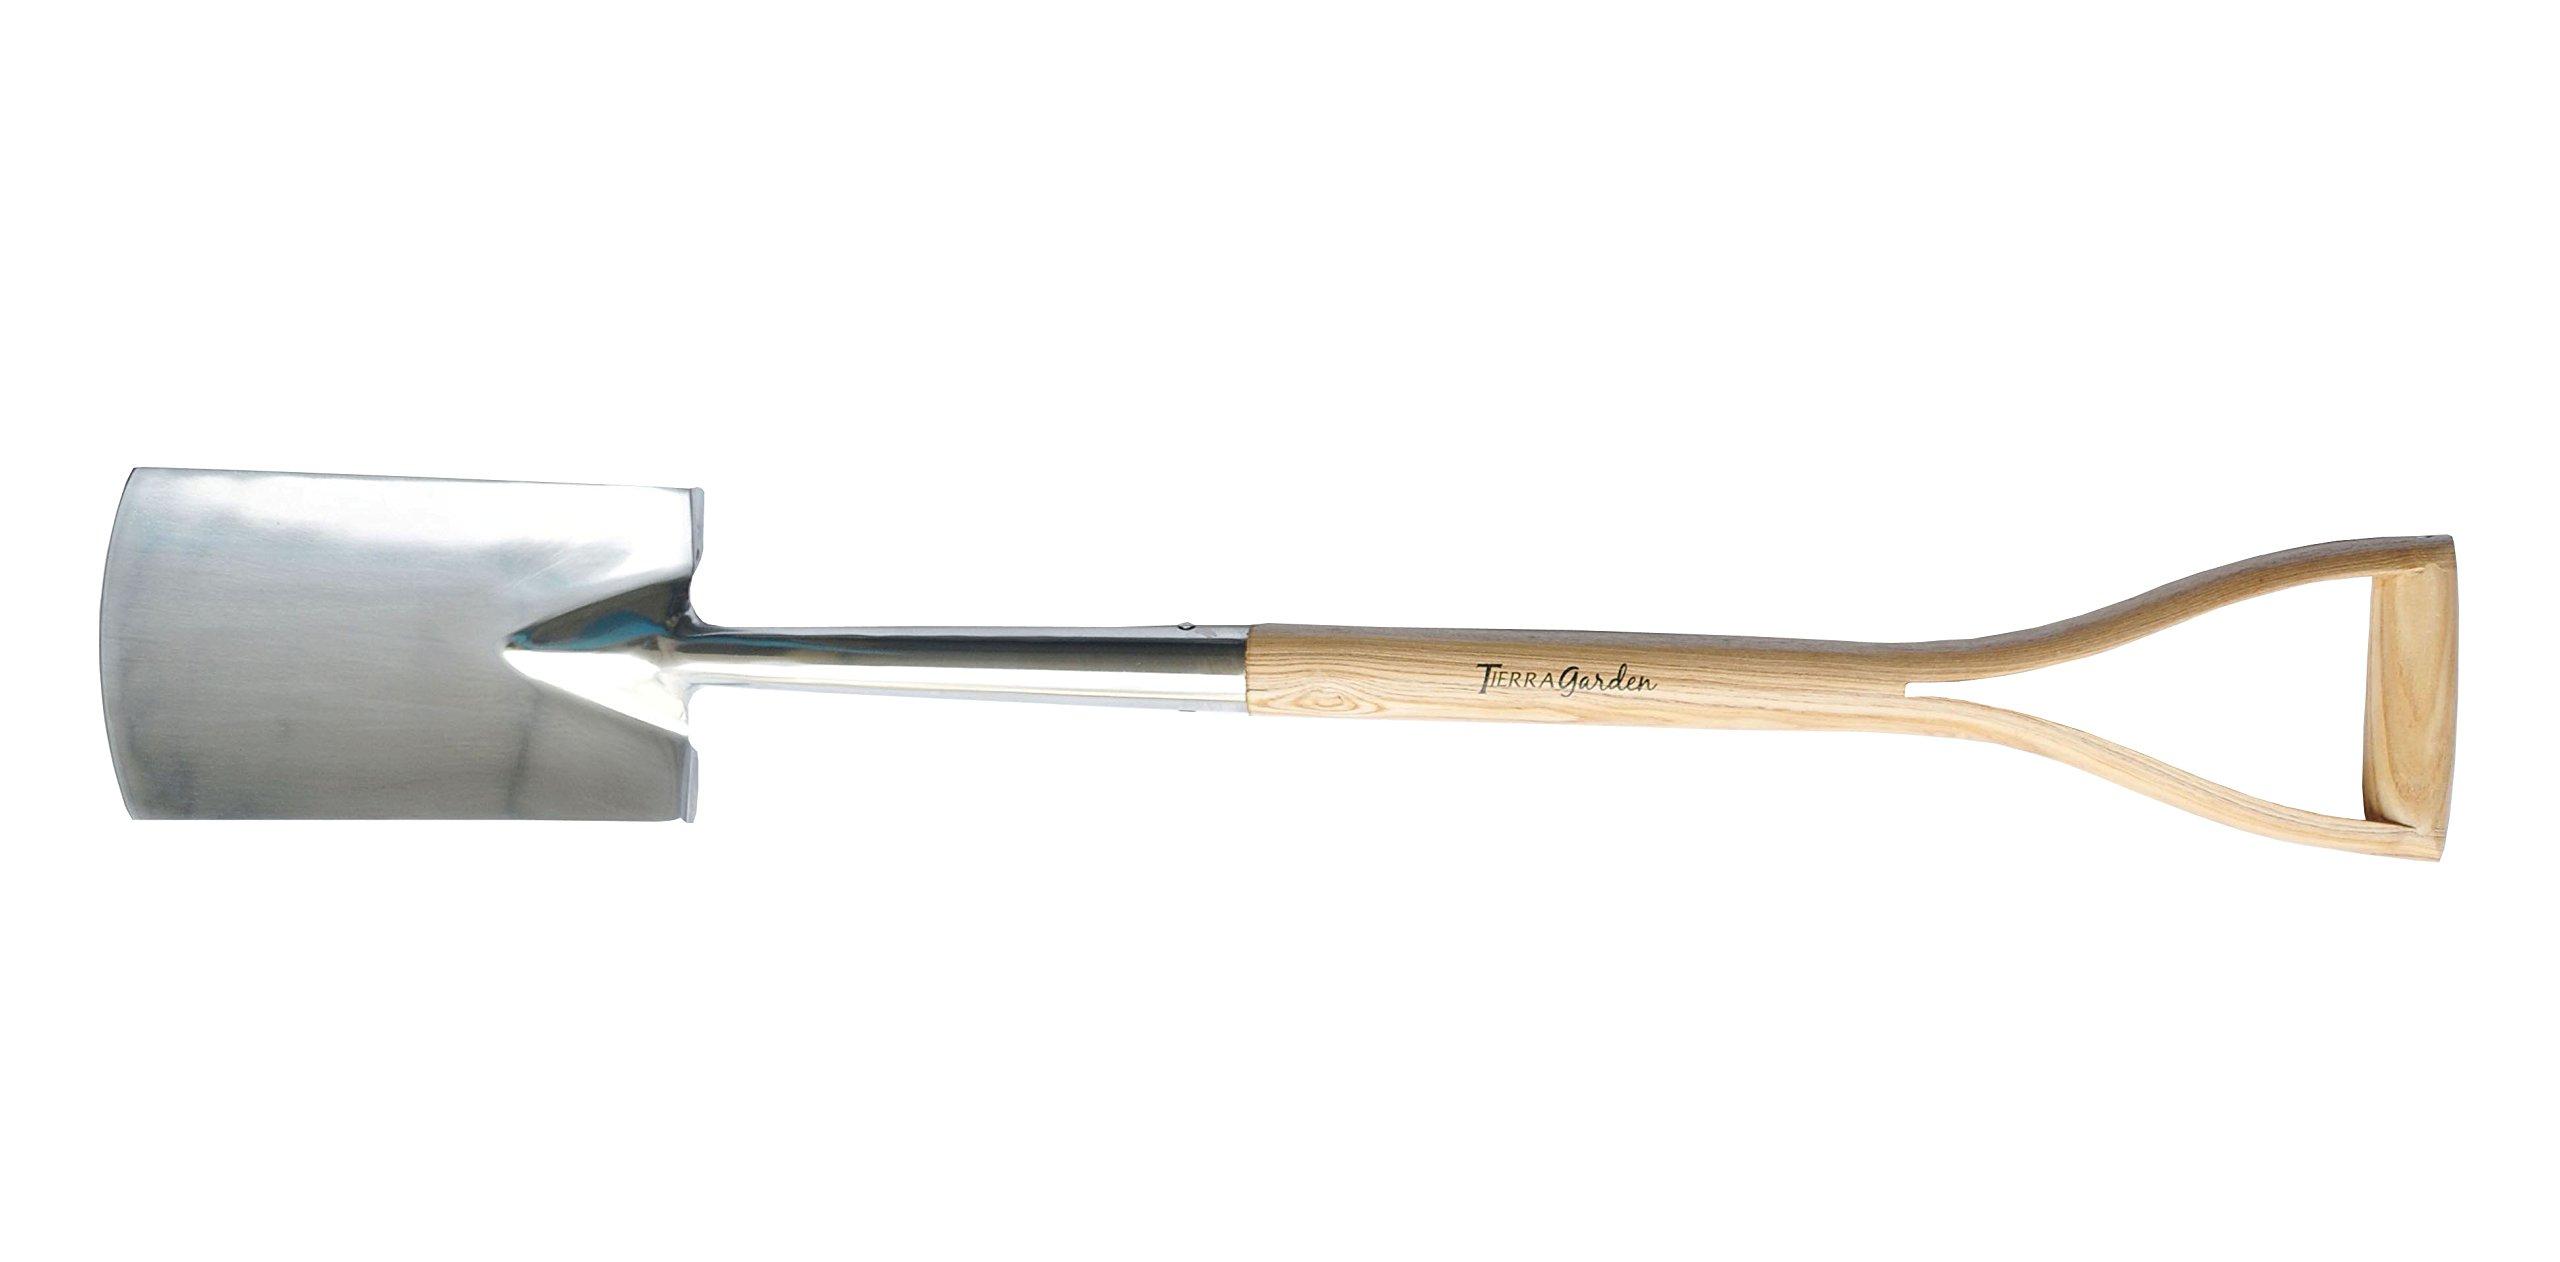 Tierra Garden 35-1810 Stainless Steel Border Spade with Ash Wood Handle